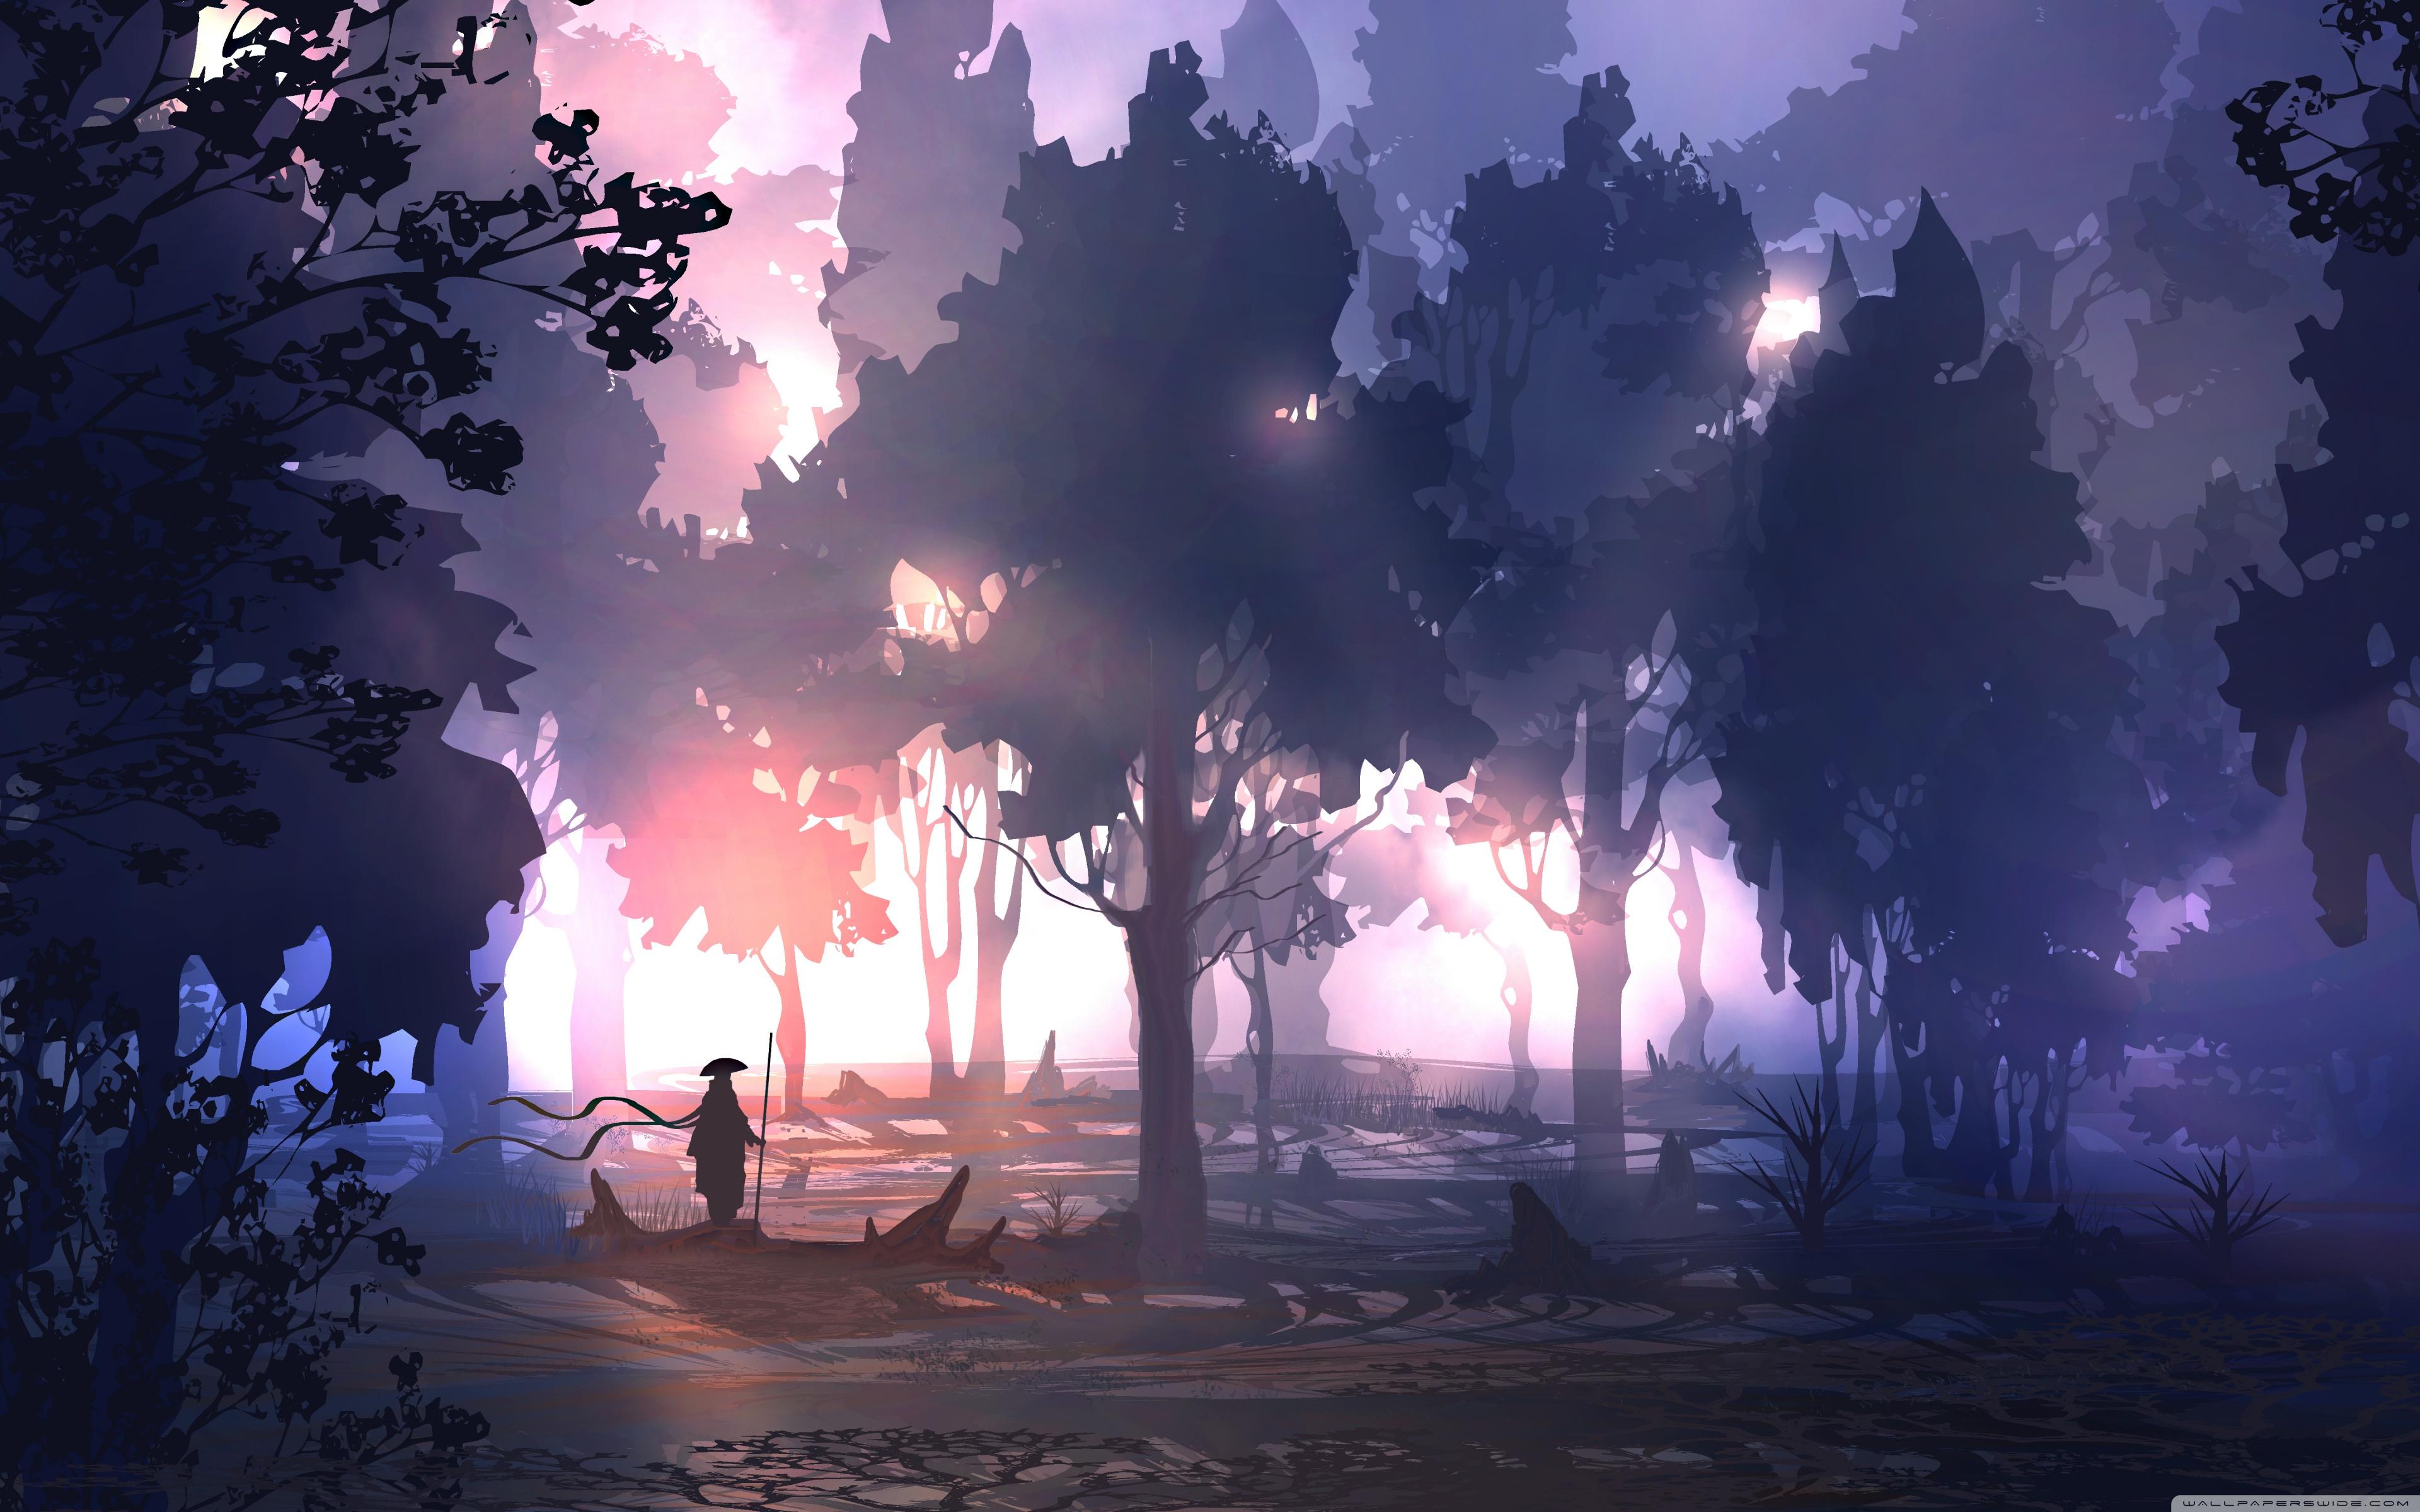 Fantasy Art 2295096 Hd Wallpaper Backgrounds Download